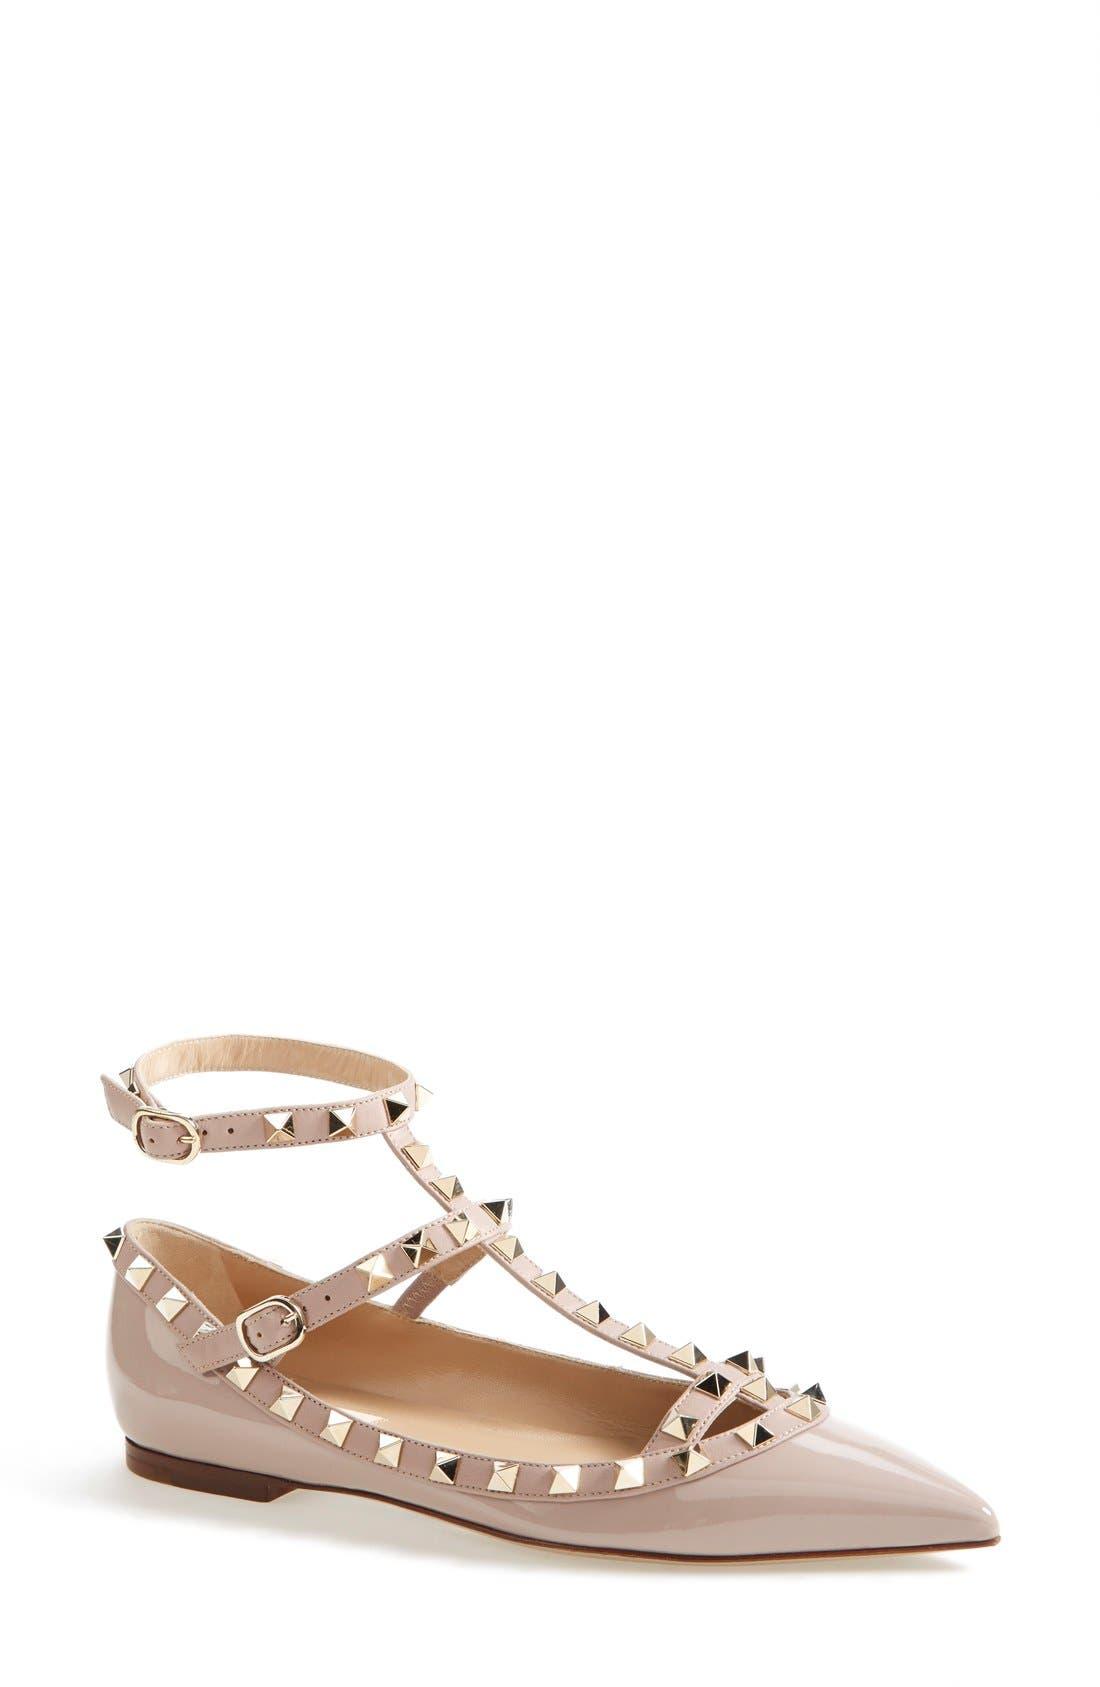 Main Image - Valentino 'Rockstud' Patent Leather T-Strap Ballerina Flat (Women)